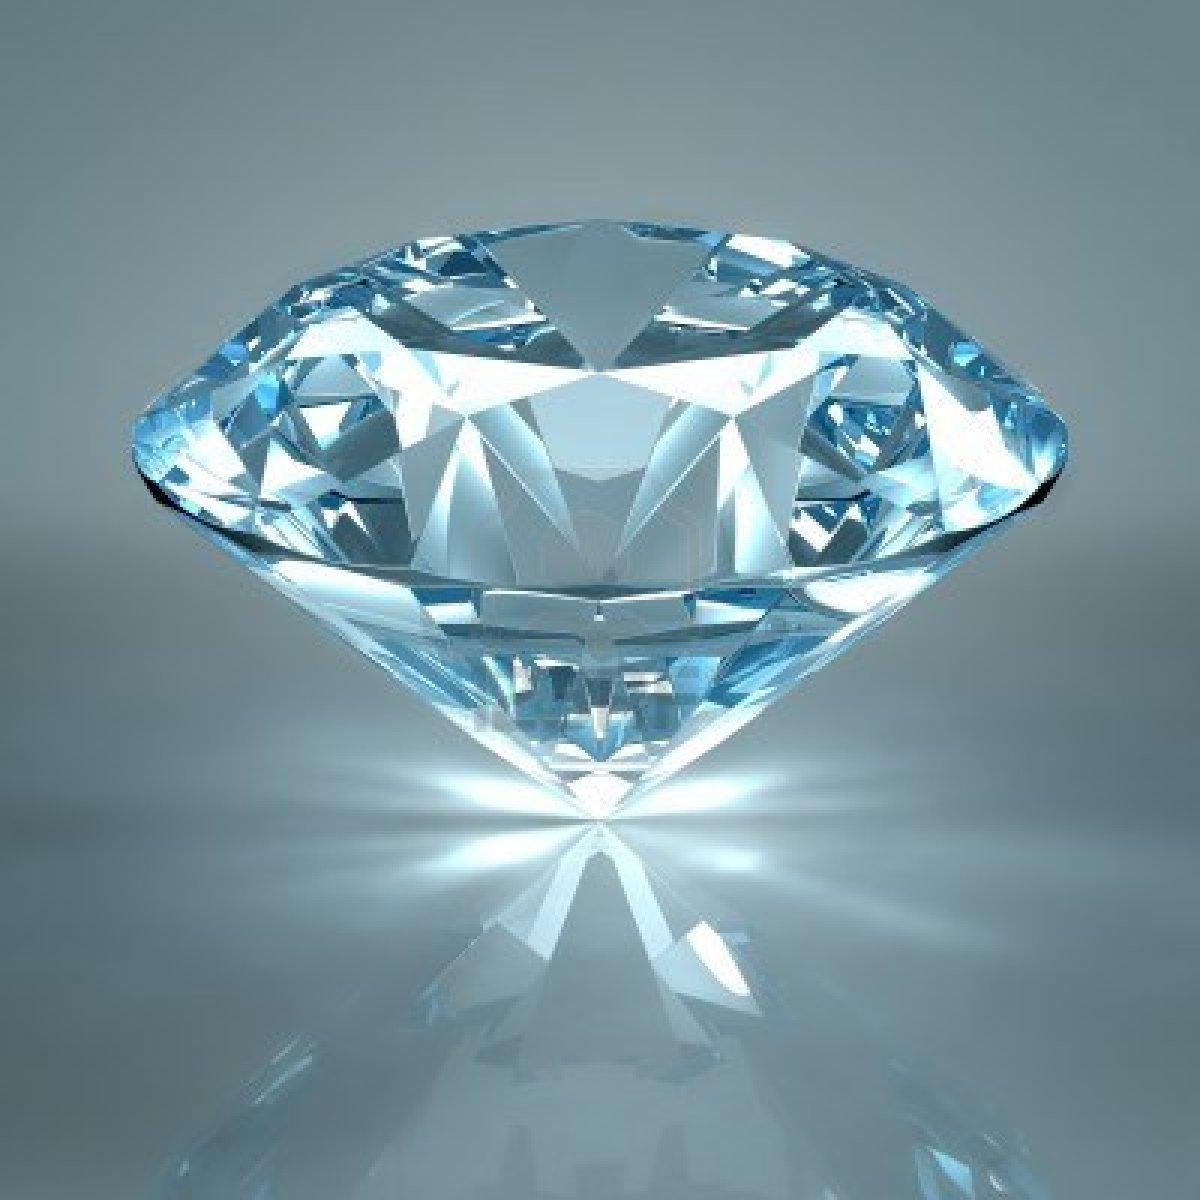 Wollpepar Diamond: Rough Diamond